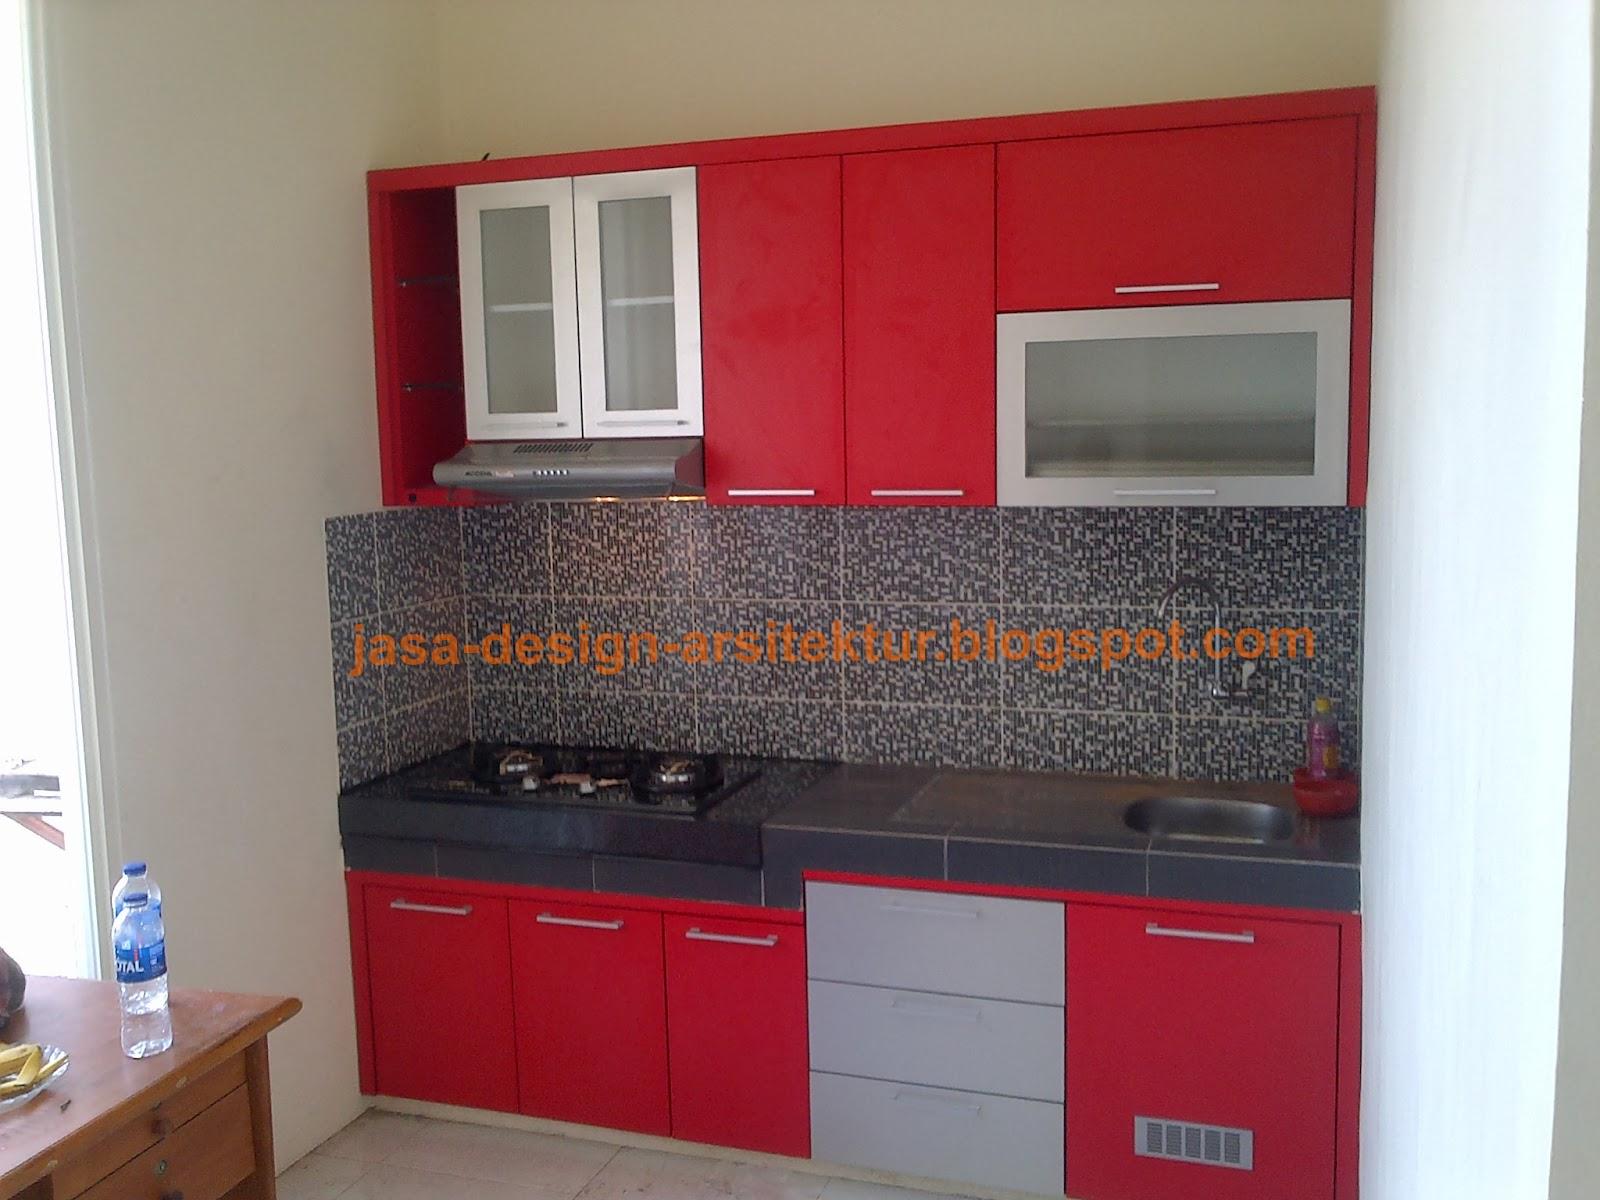 Kontraktor interior surabaya sidoarjo januari 2015 for Kitchen set lurus